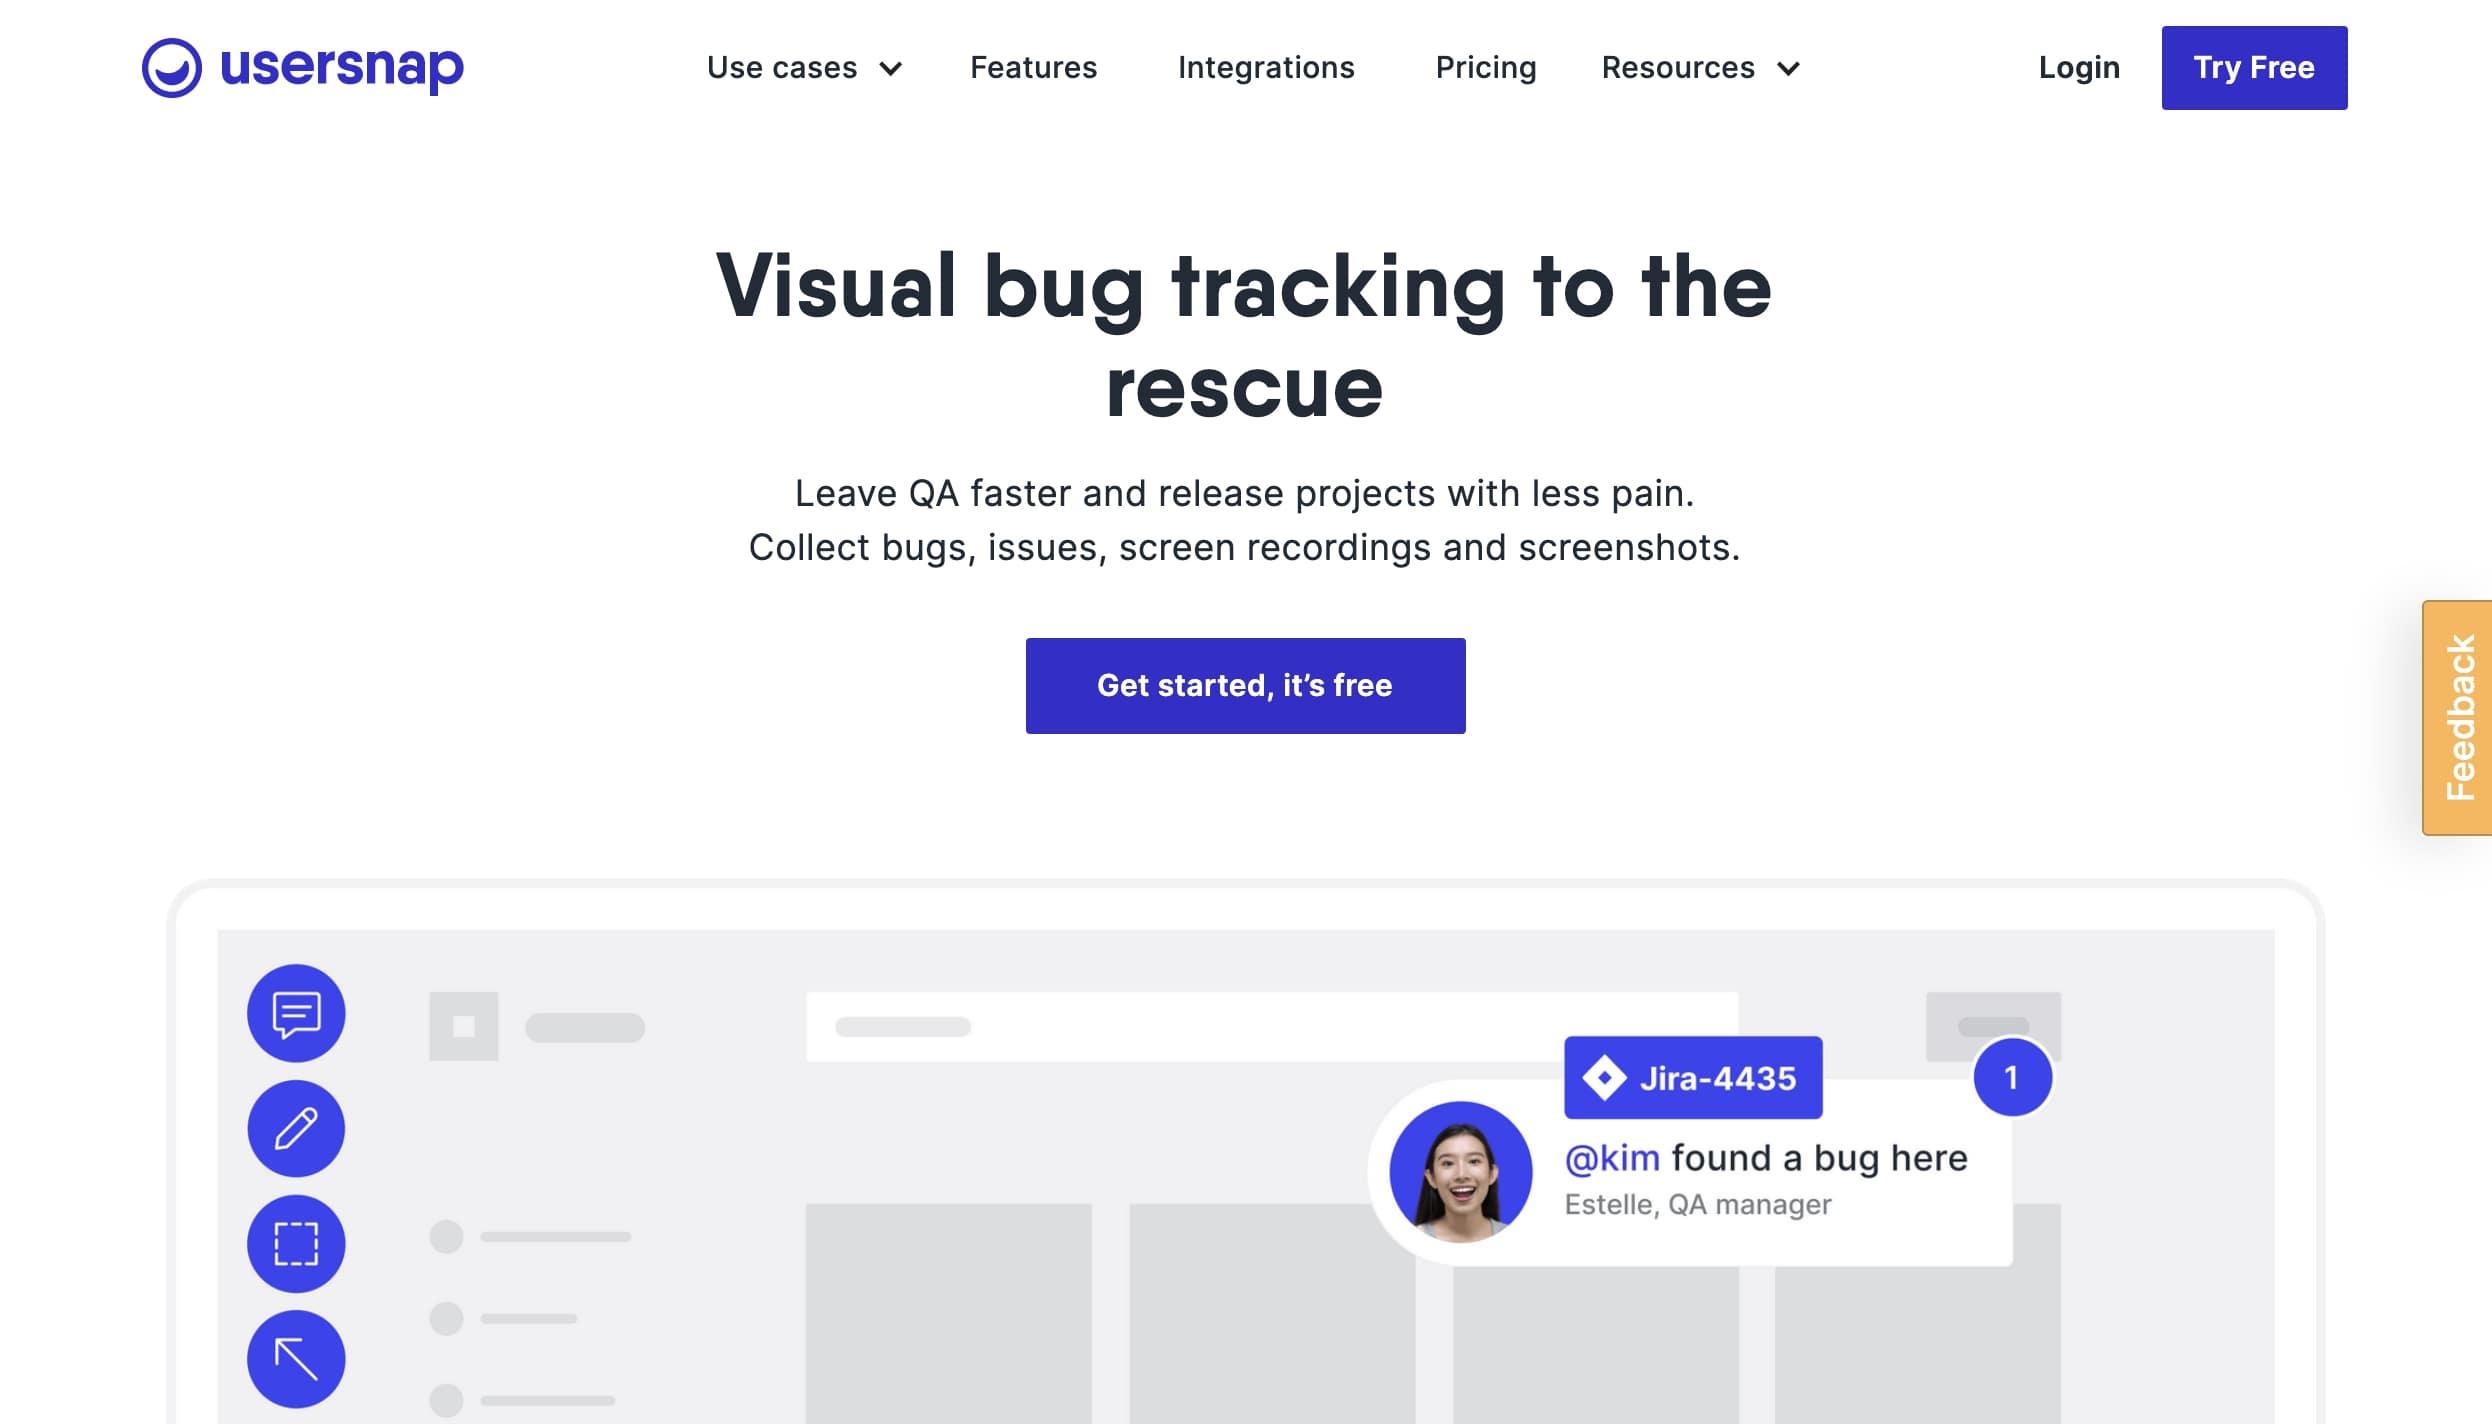 usersnap website